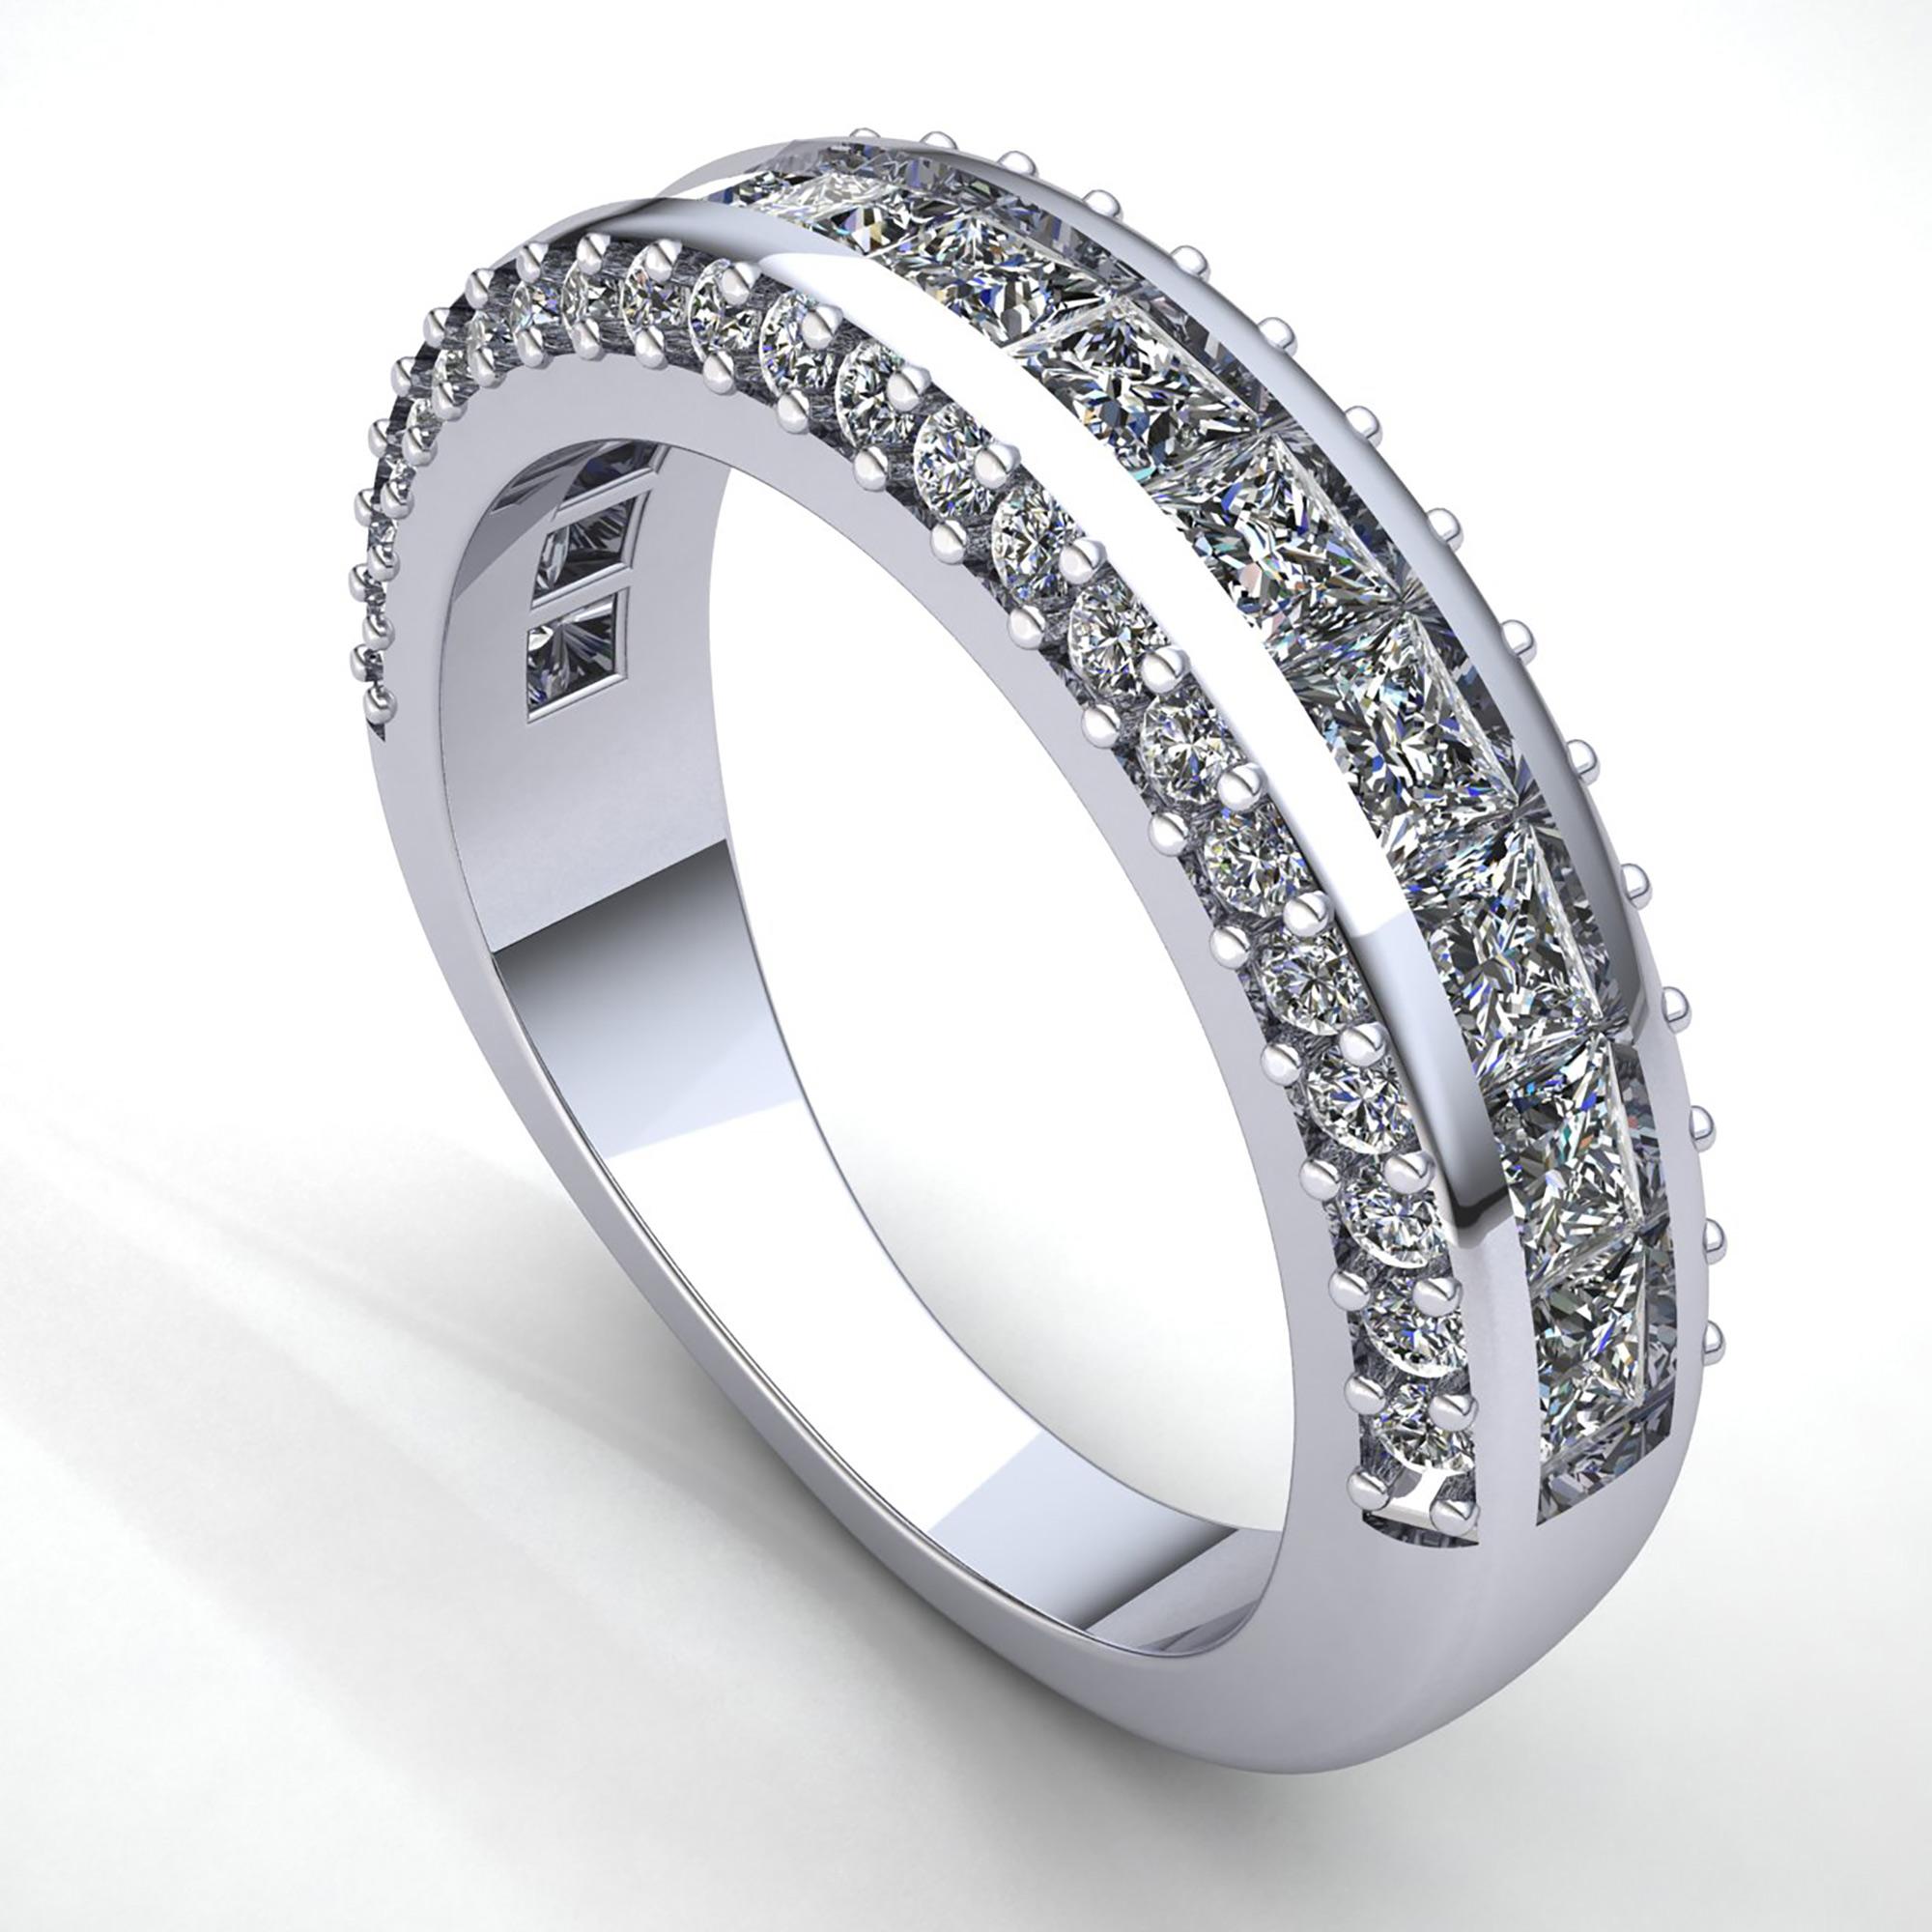 Original-2ct-Diamante-Talla-Princesa-Mujer-Senora-Elegante-Aniversario-Alianza